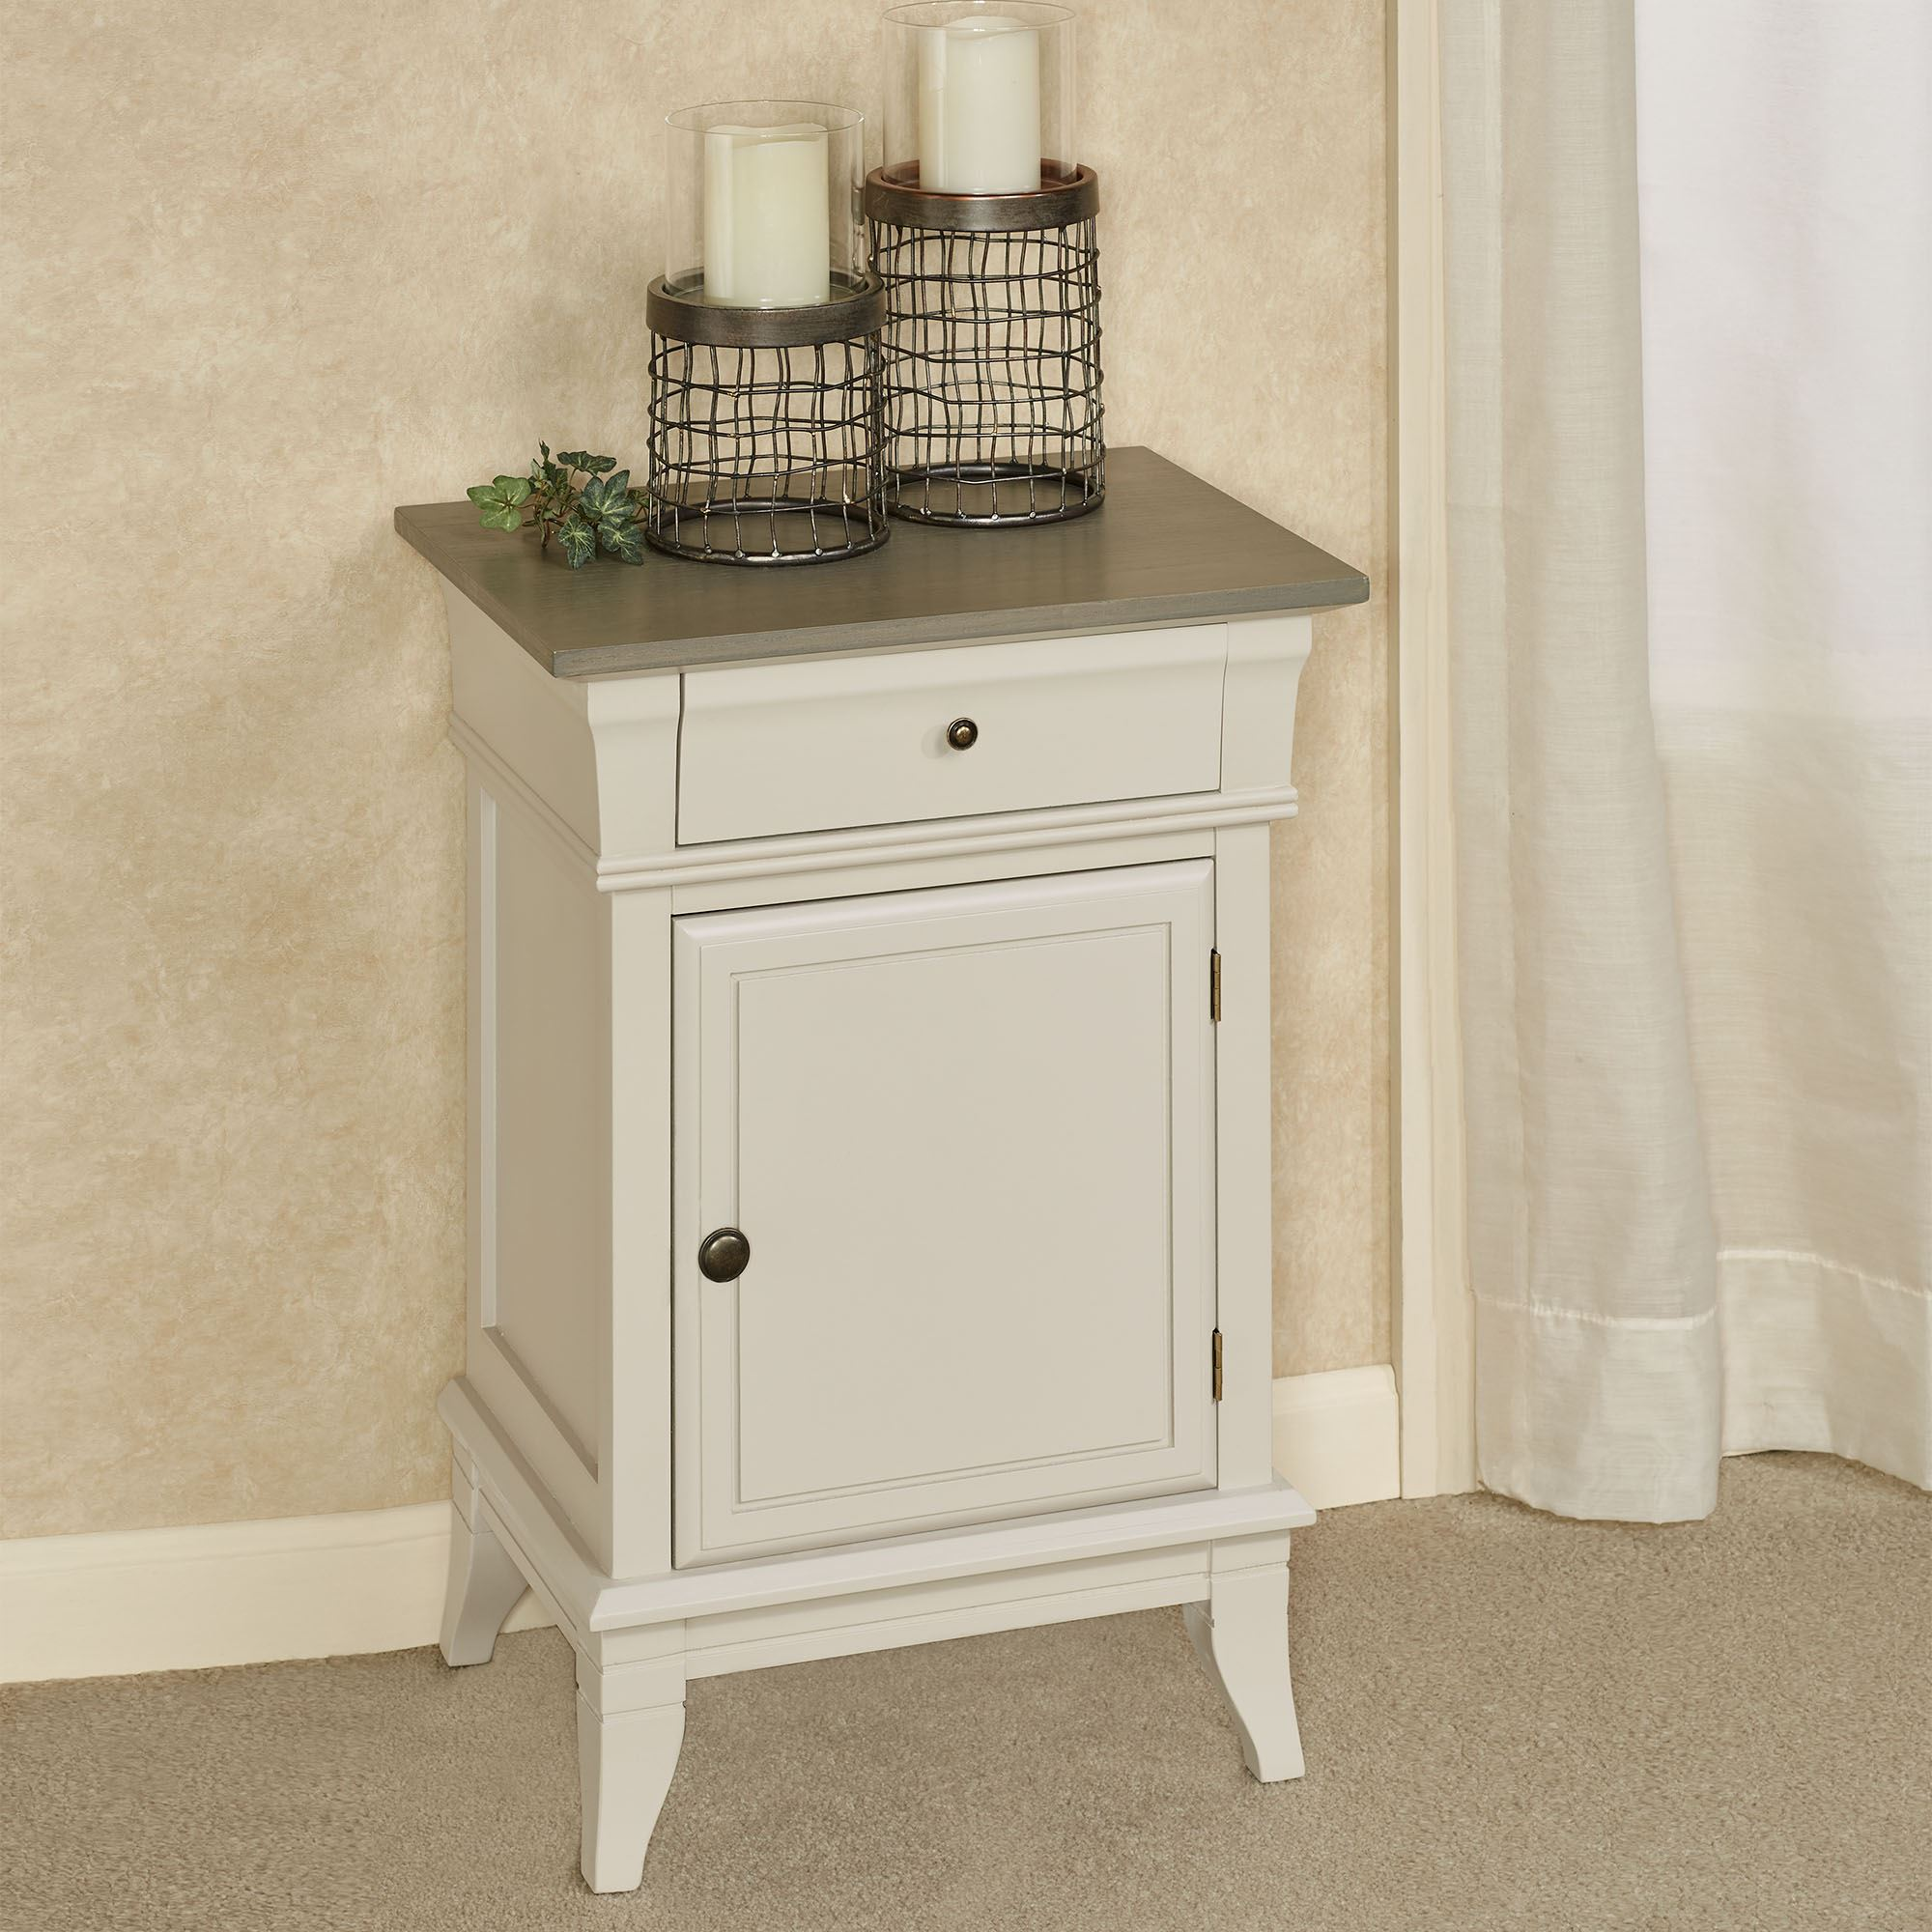 Off White Wooden Side Storage Cabinet